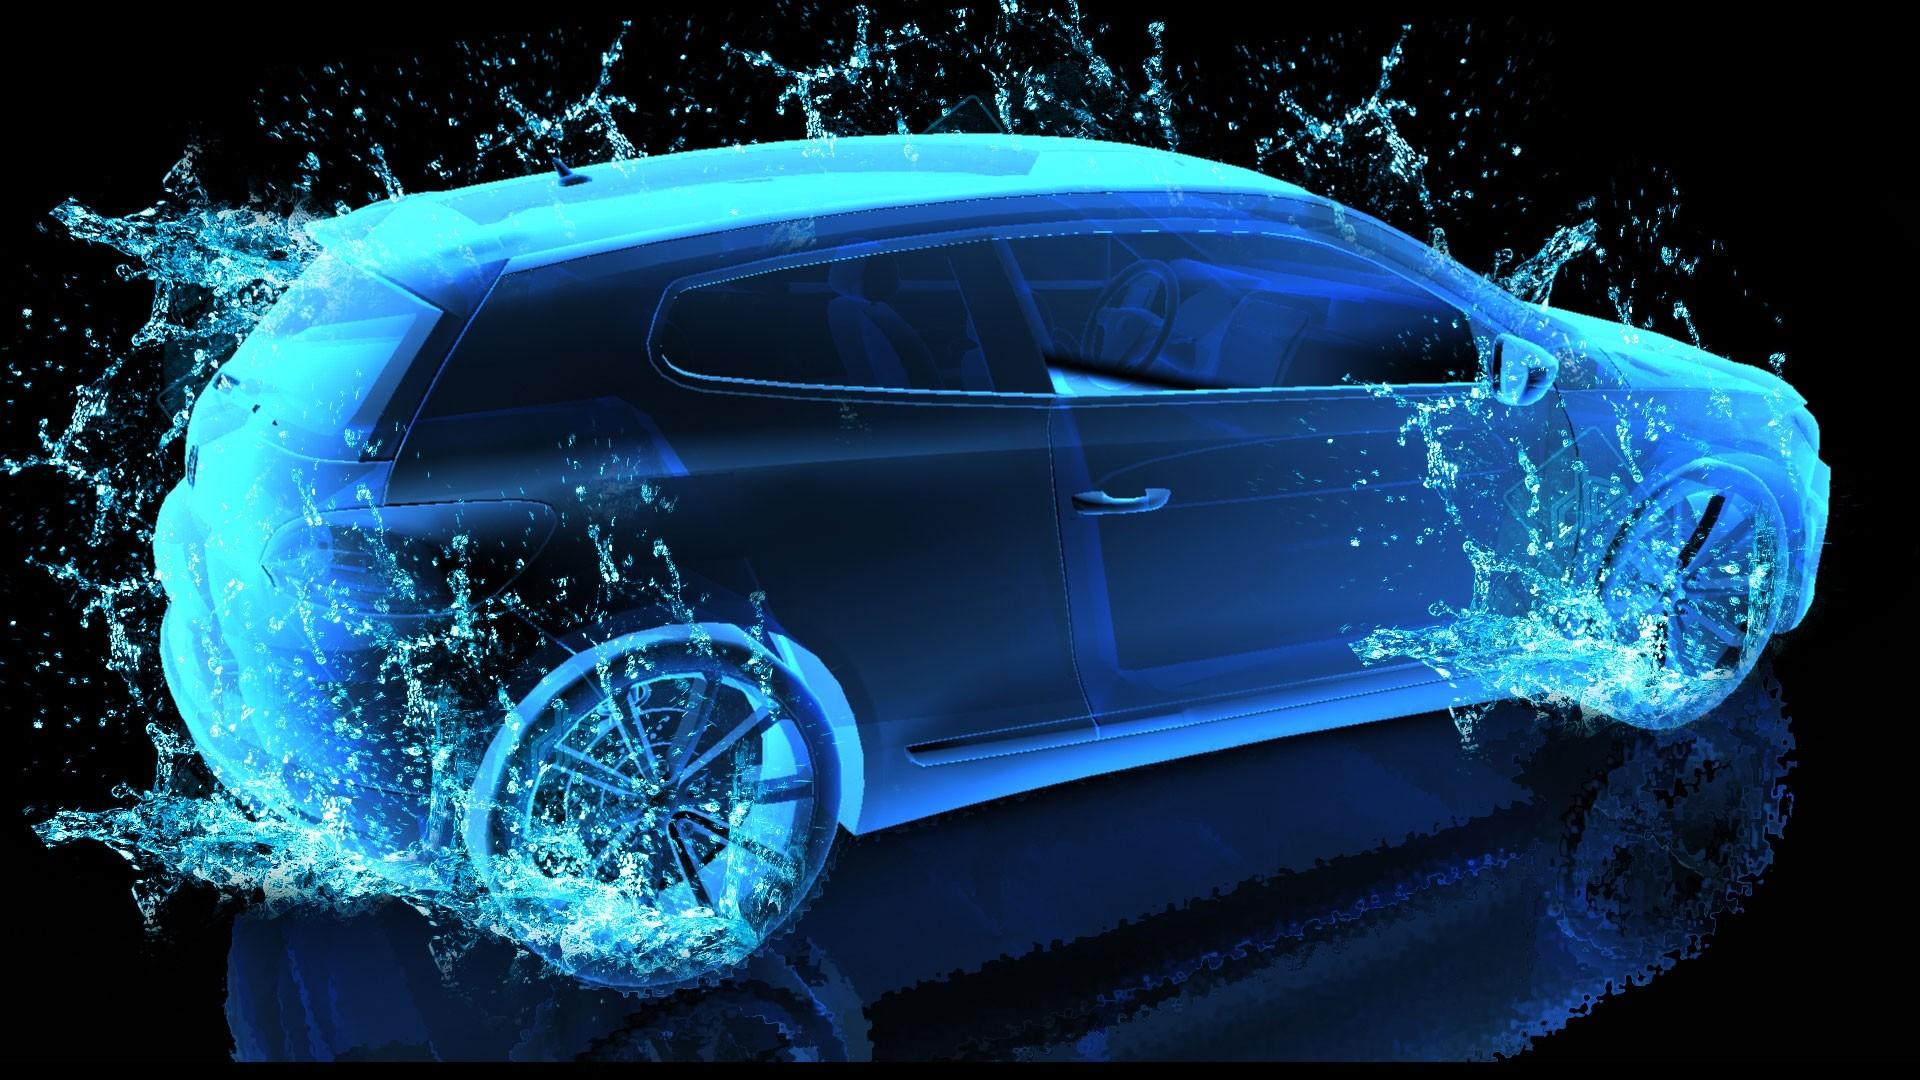 Neon Car Wallpaper: Neon Cars Wallpapers ·① WallpaperTag